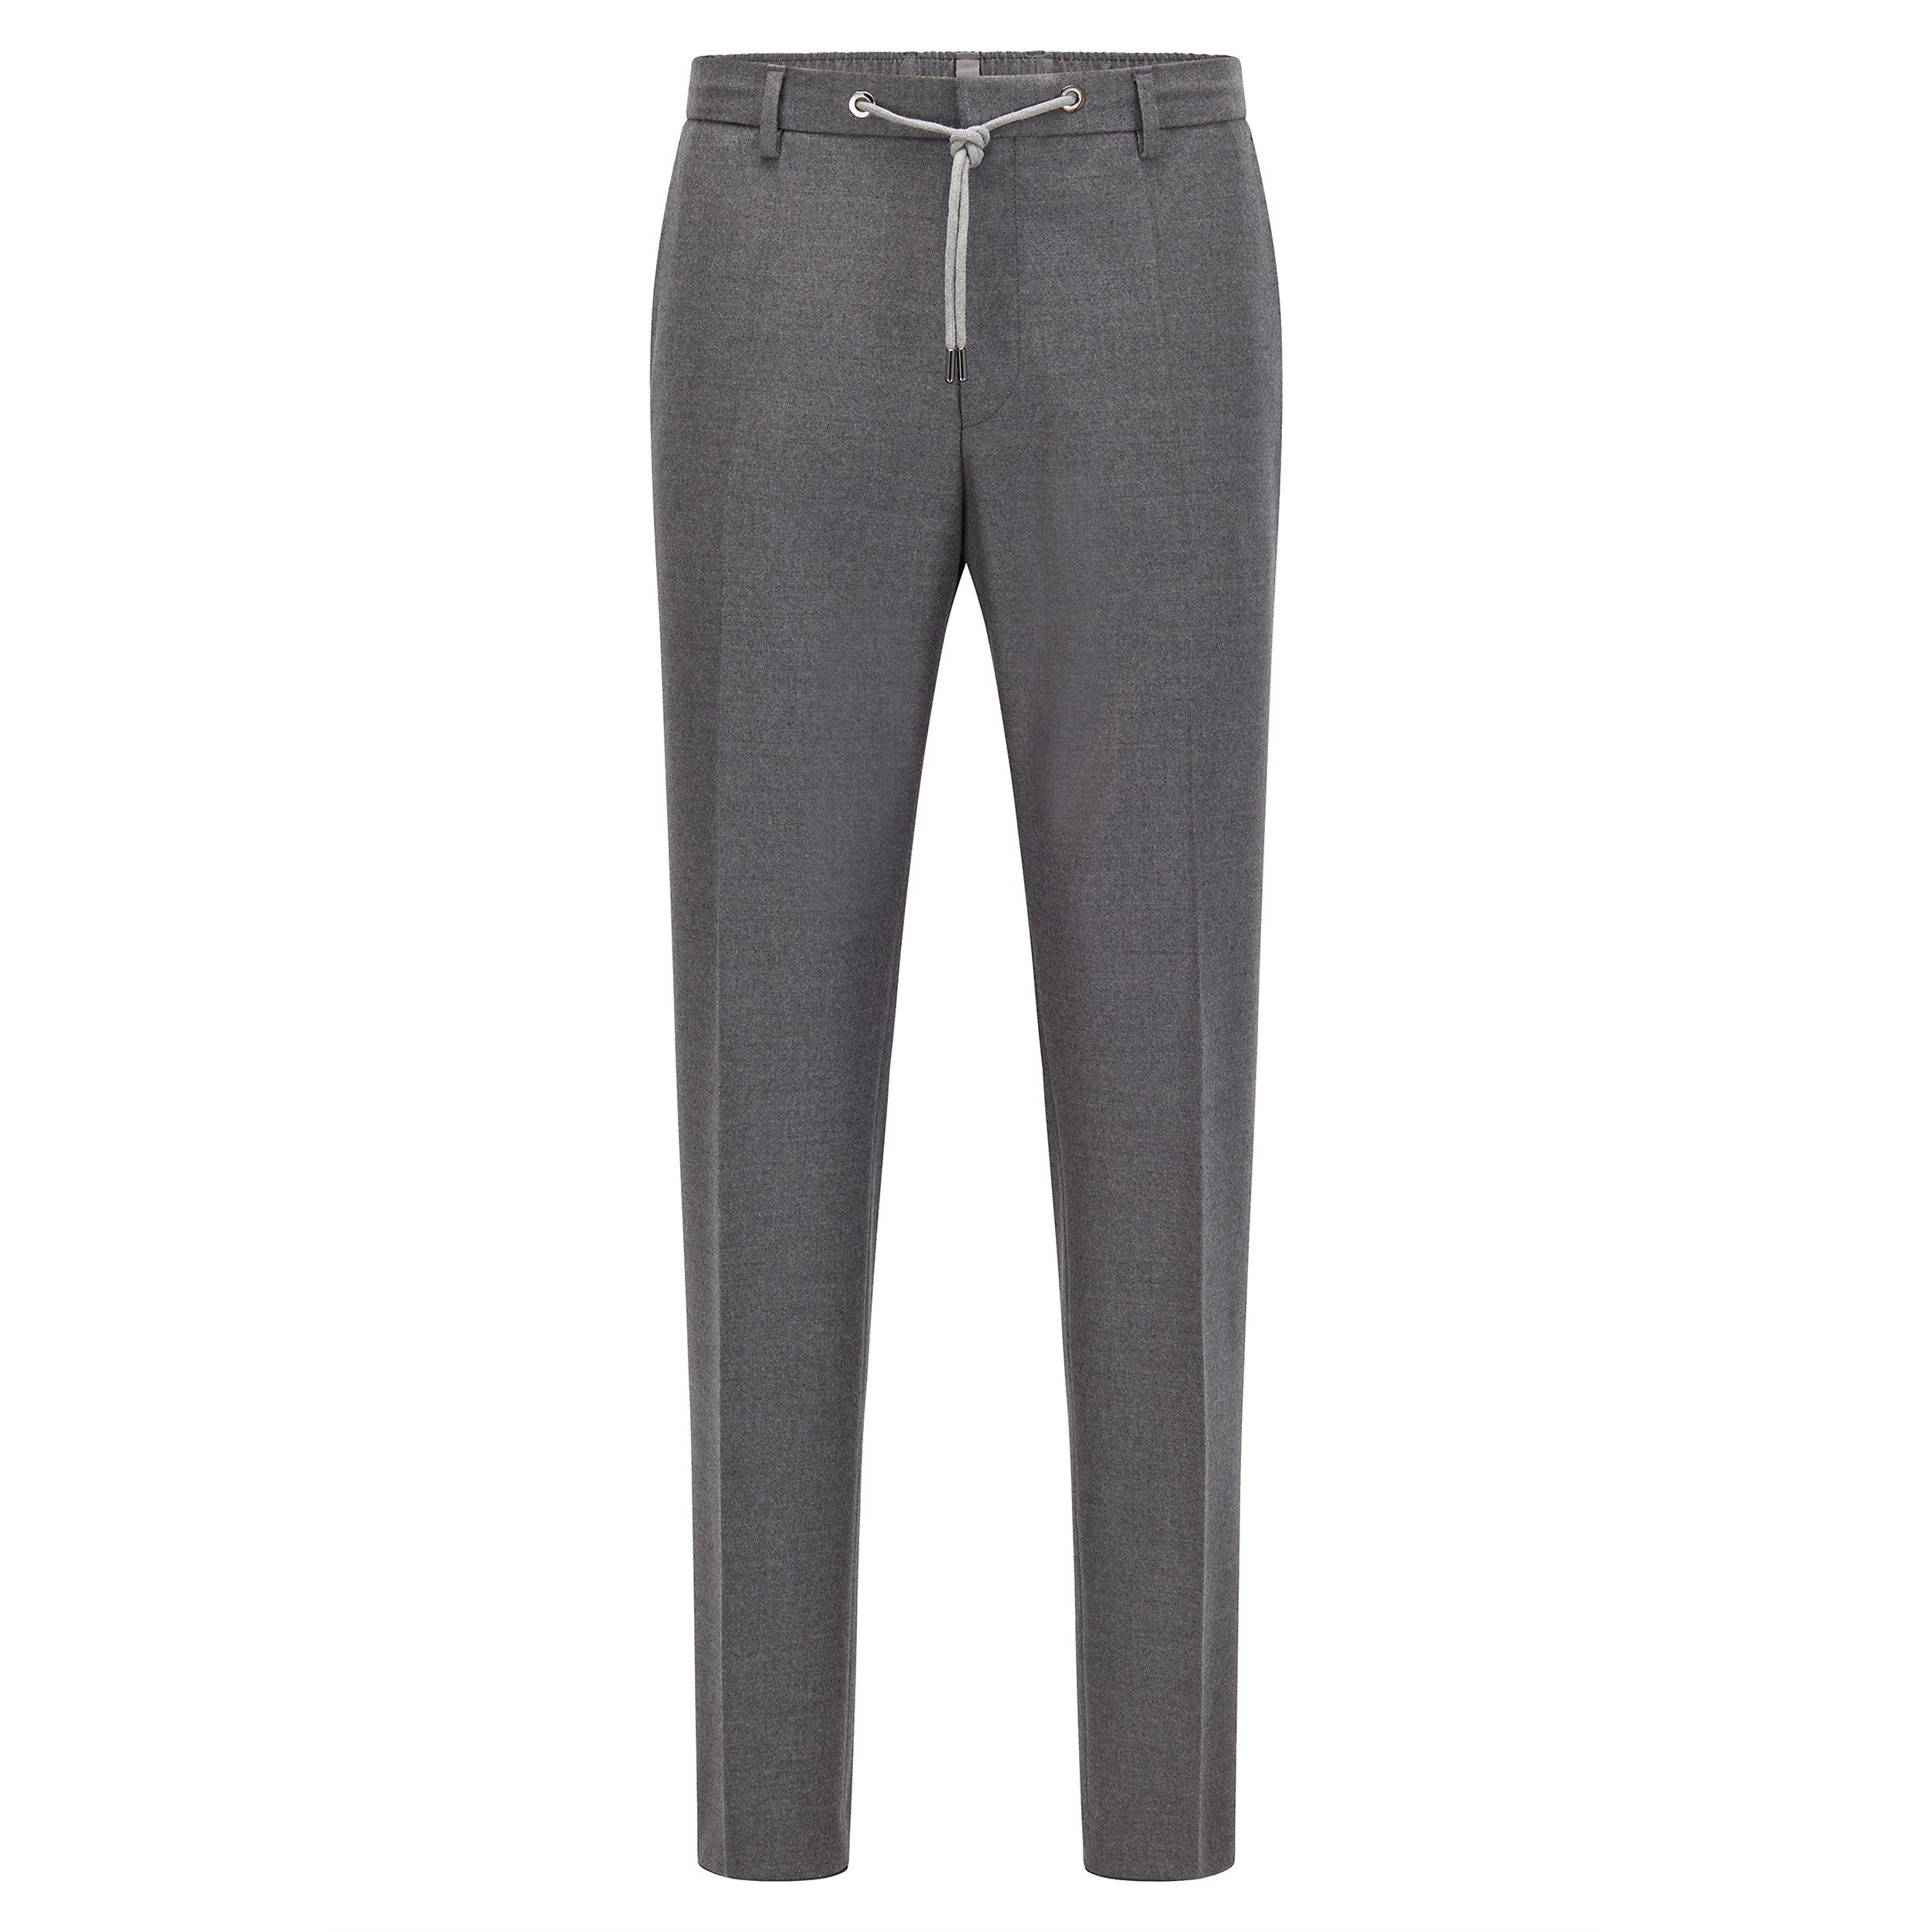 Straight cut trousers in gray flannel BOSS | Pants | 50458788030